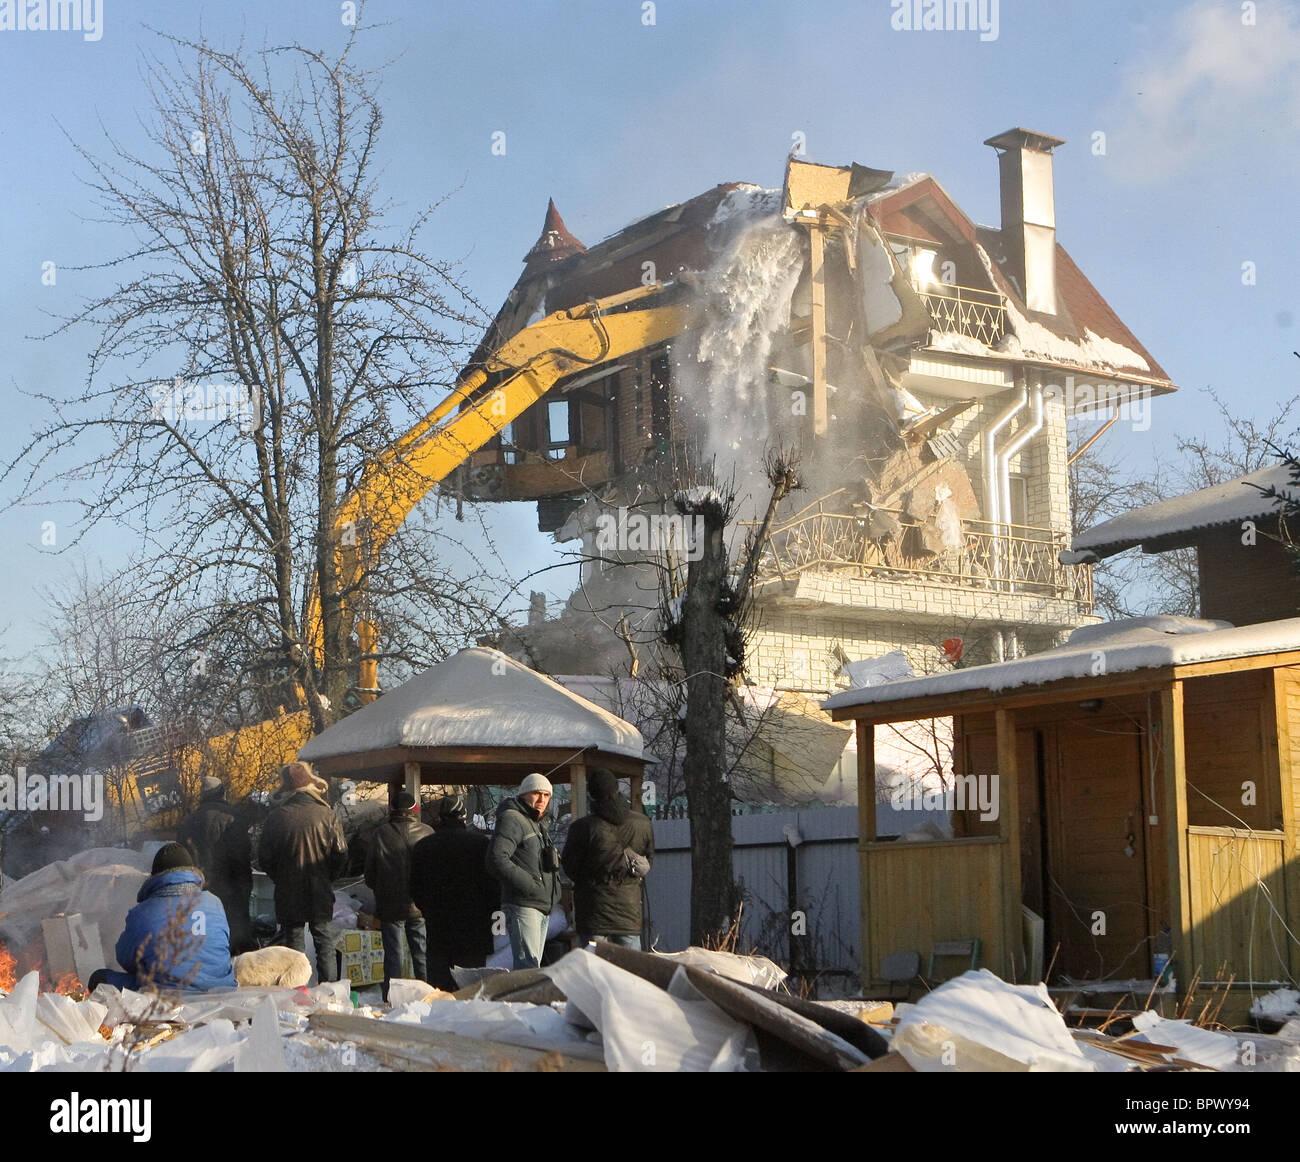 Houses in Rechnik settlement demolished - Stock Image